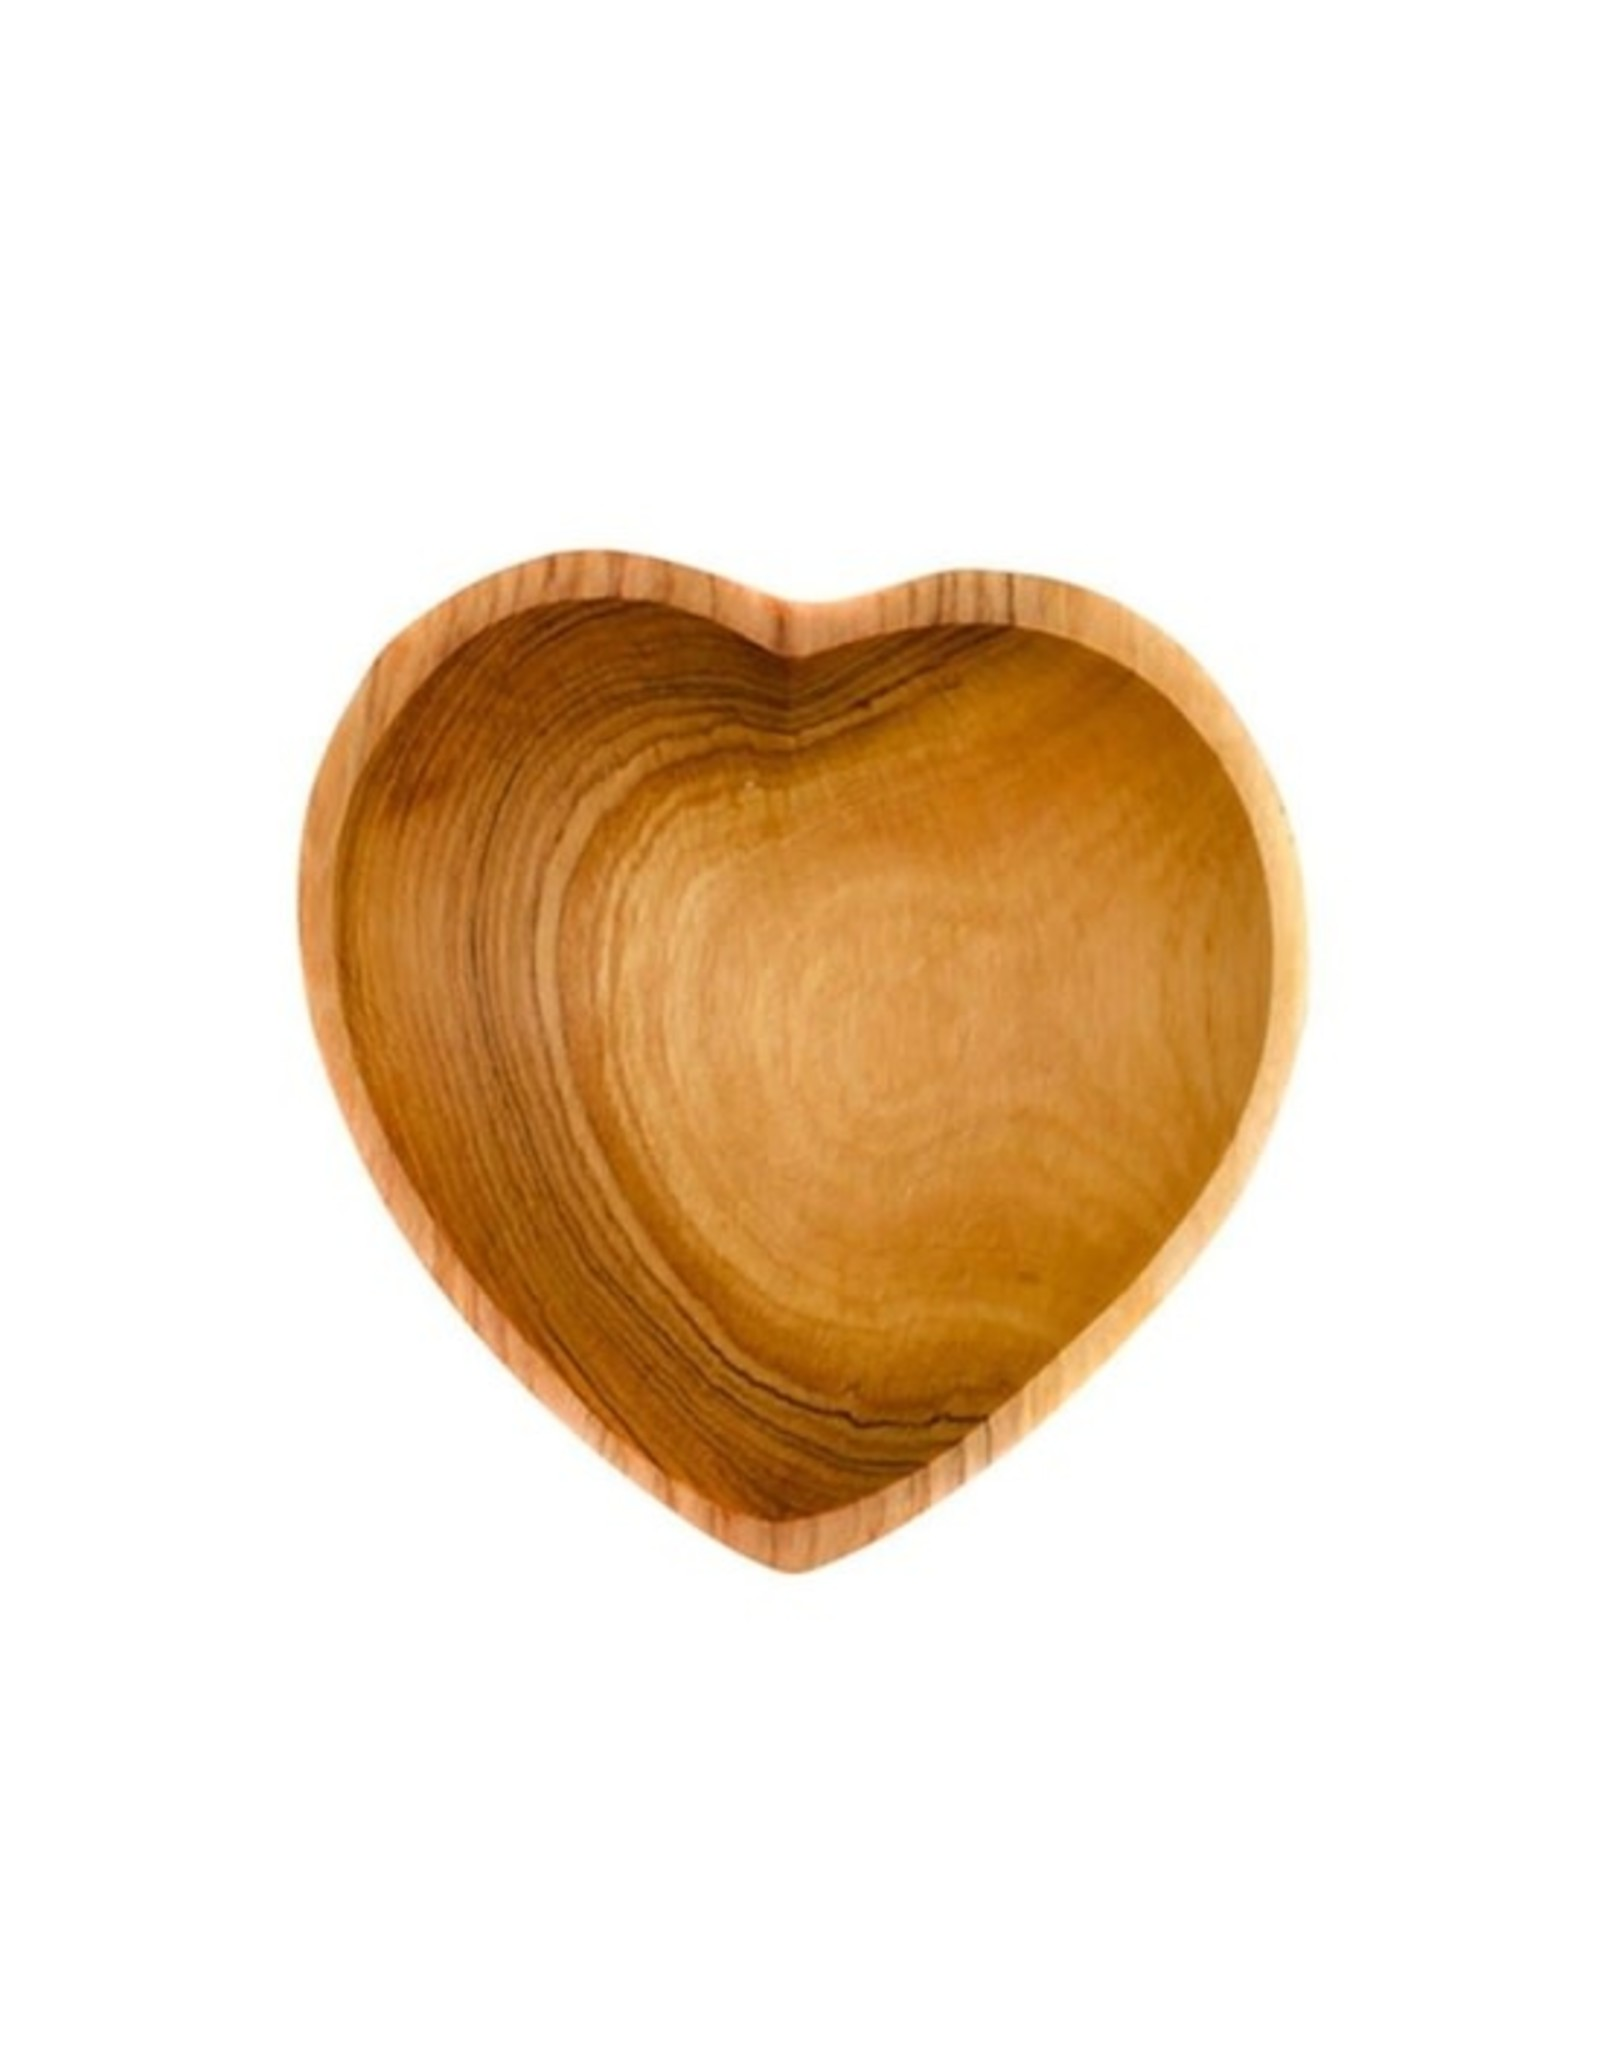 Olive Wood Heart Shaped Bowls